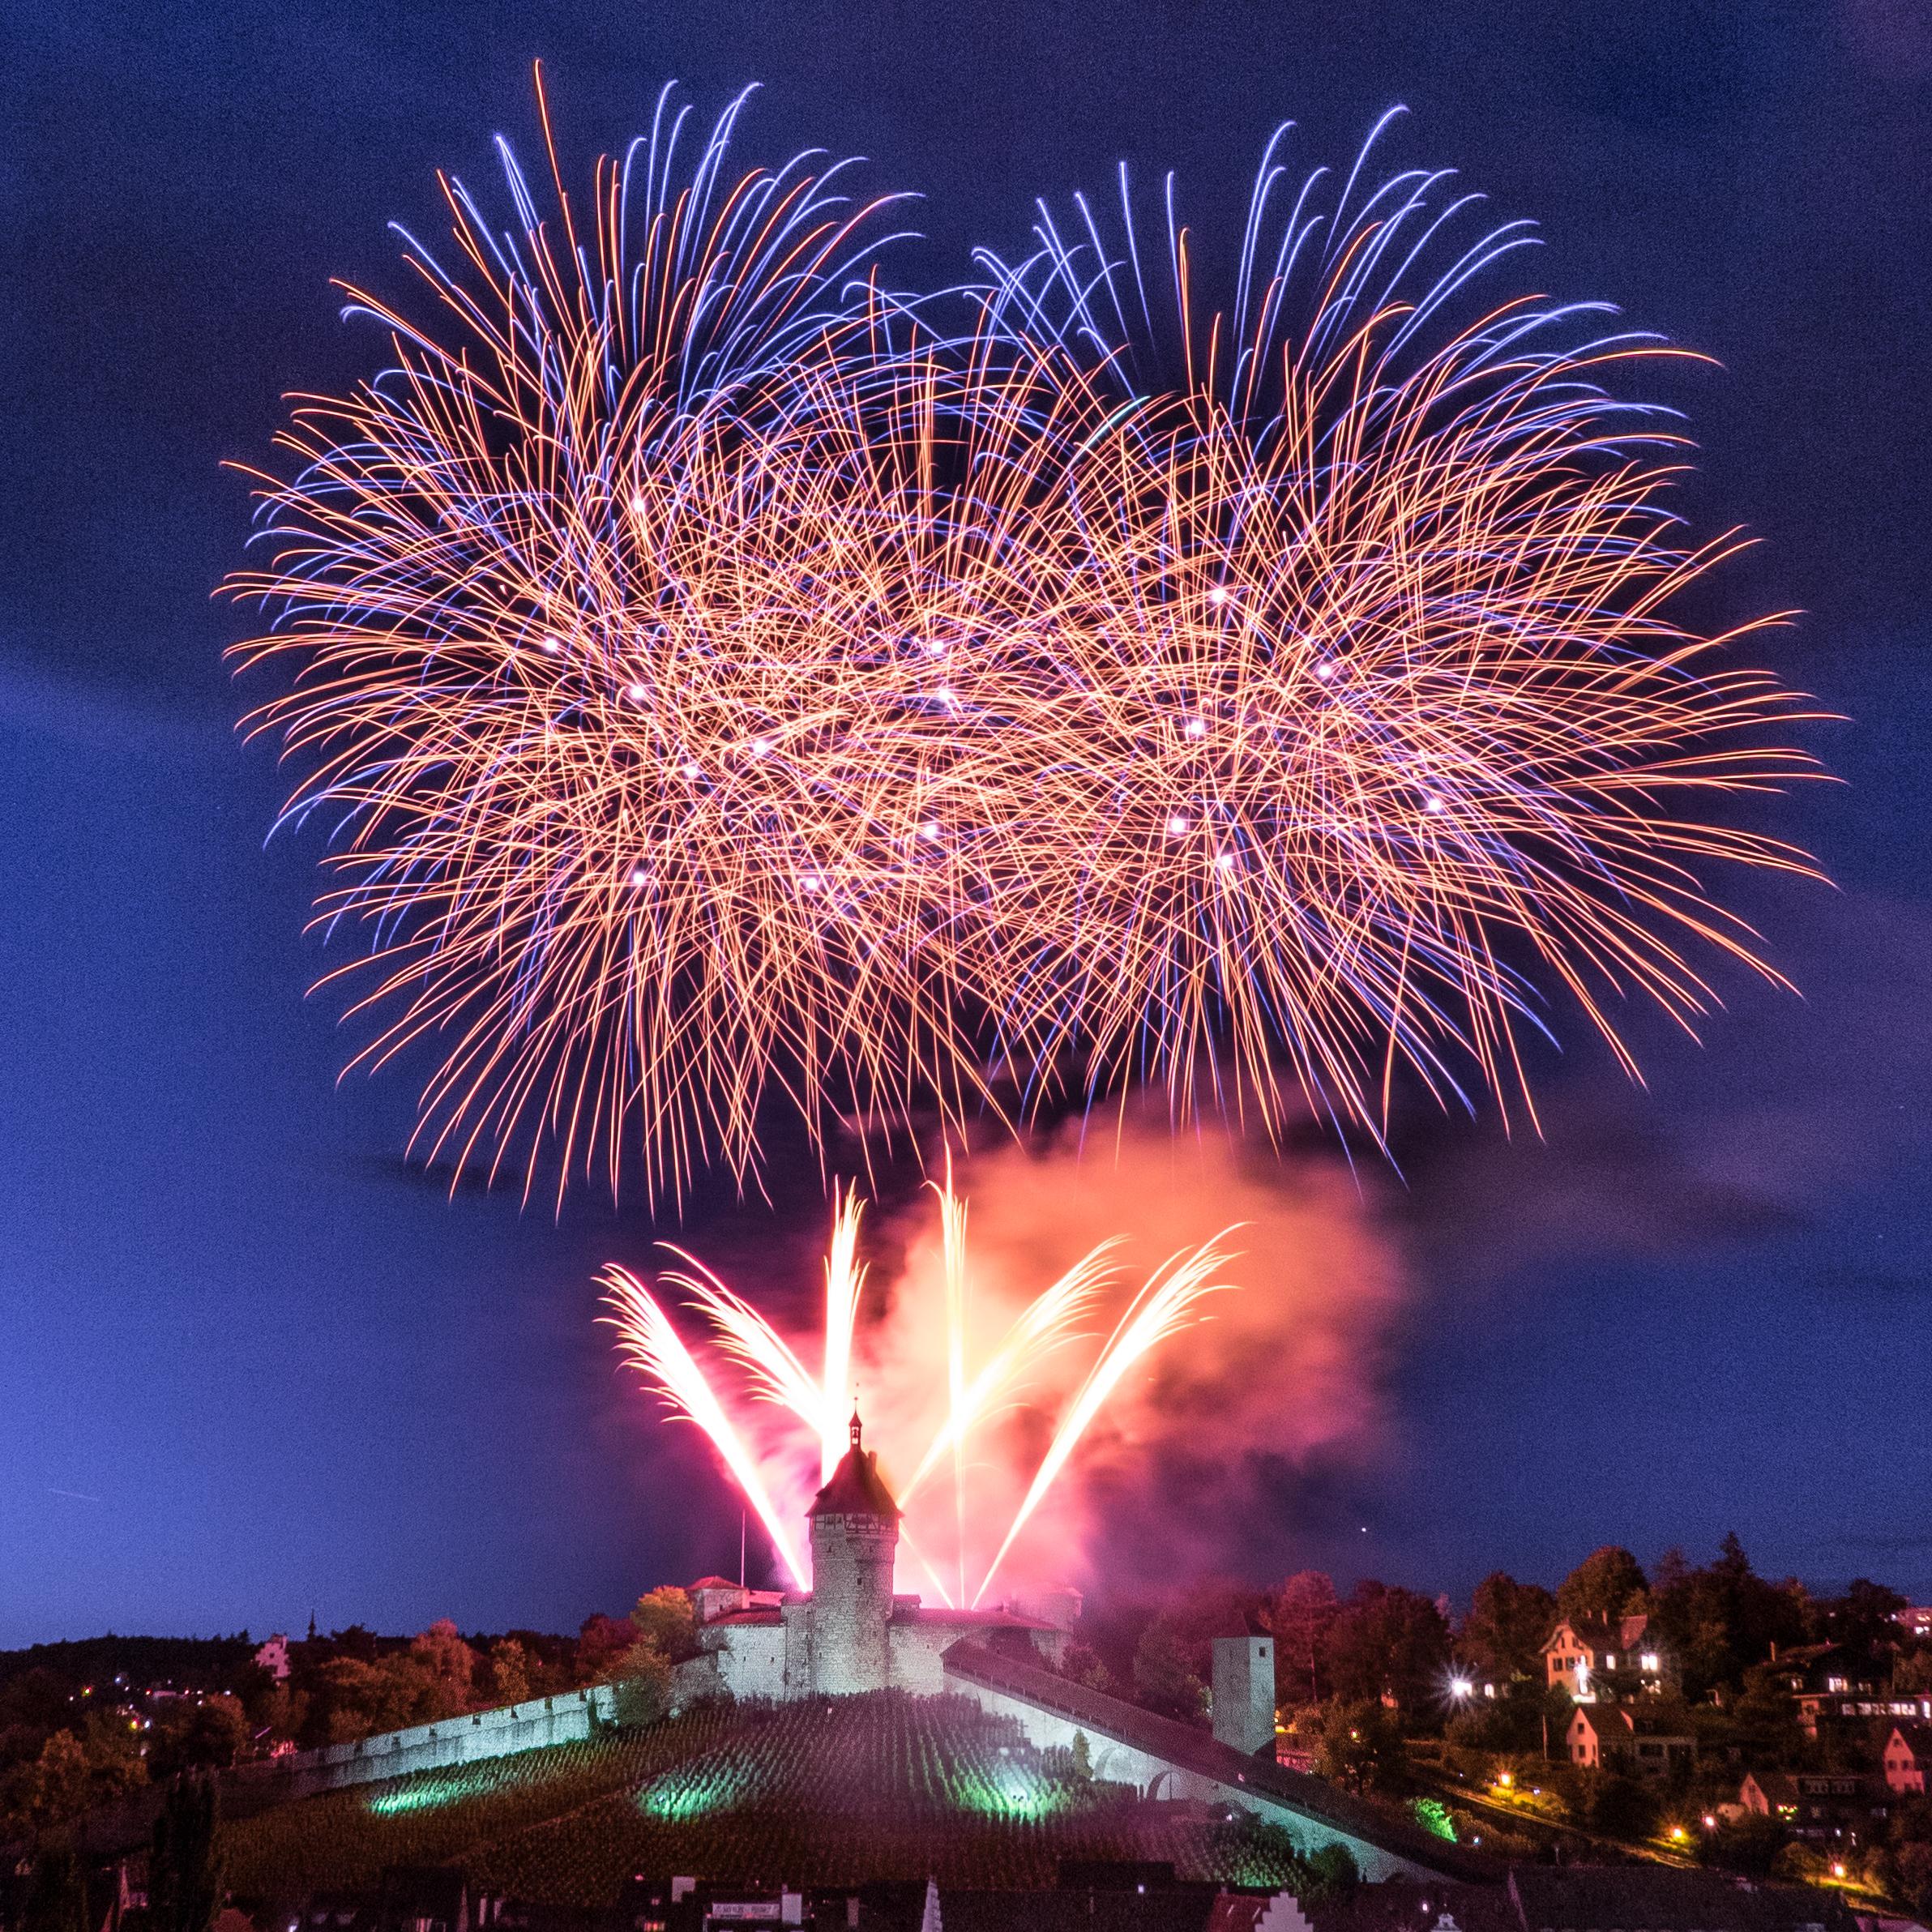 File:Munot Feuerwerk 2014.jpg - Wikimedia Commons